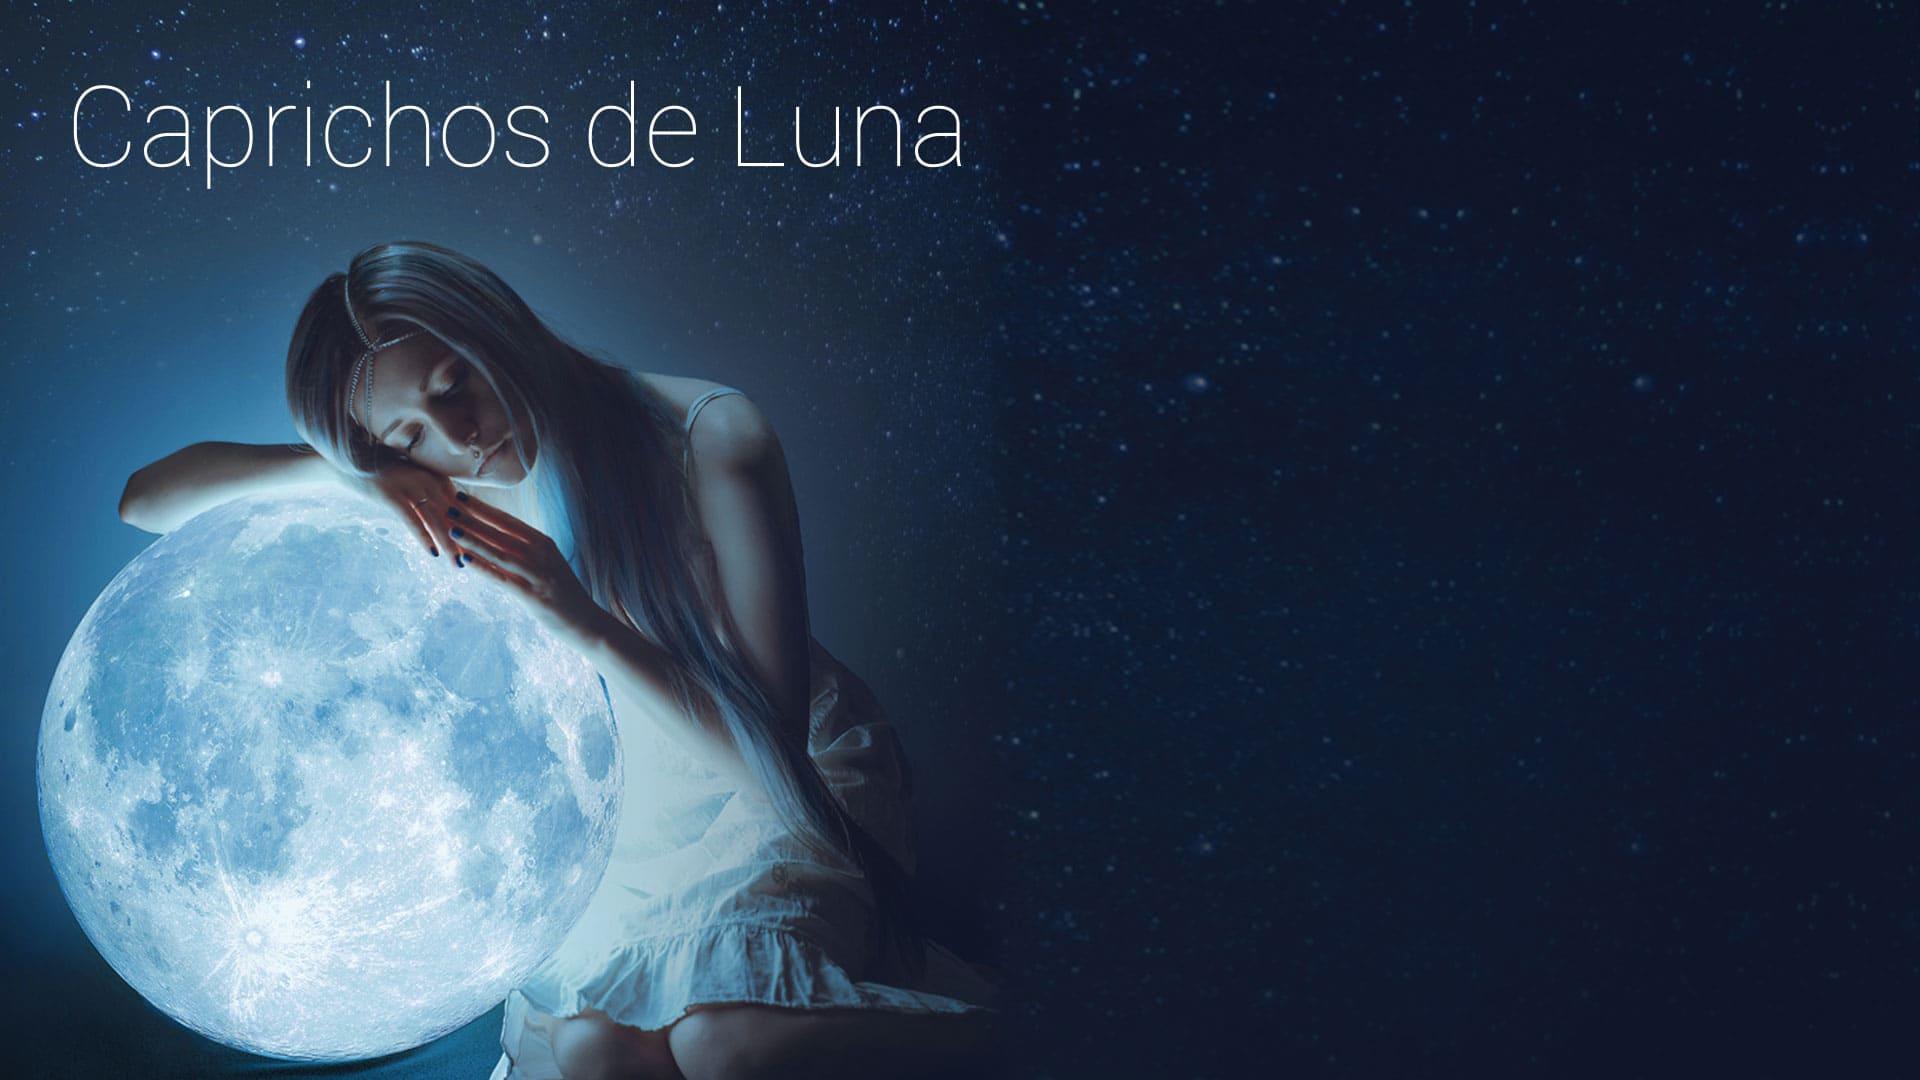 Caprichos de Luna